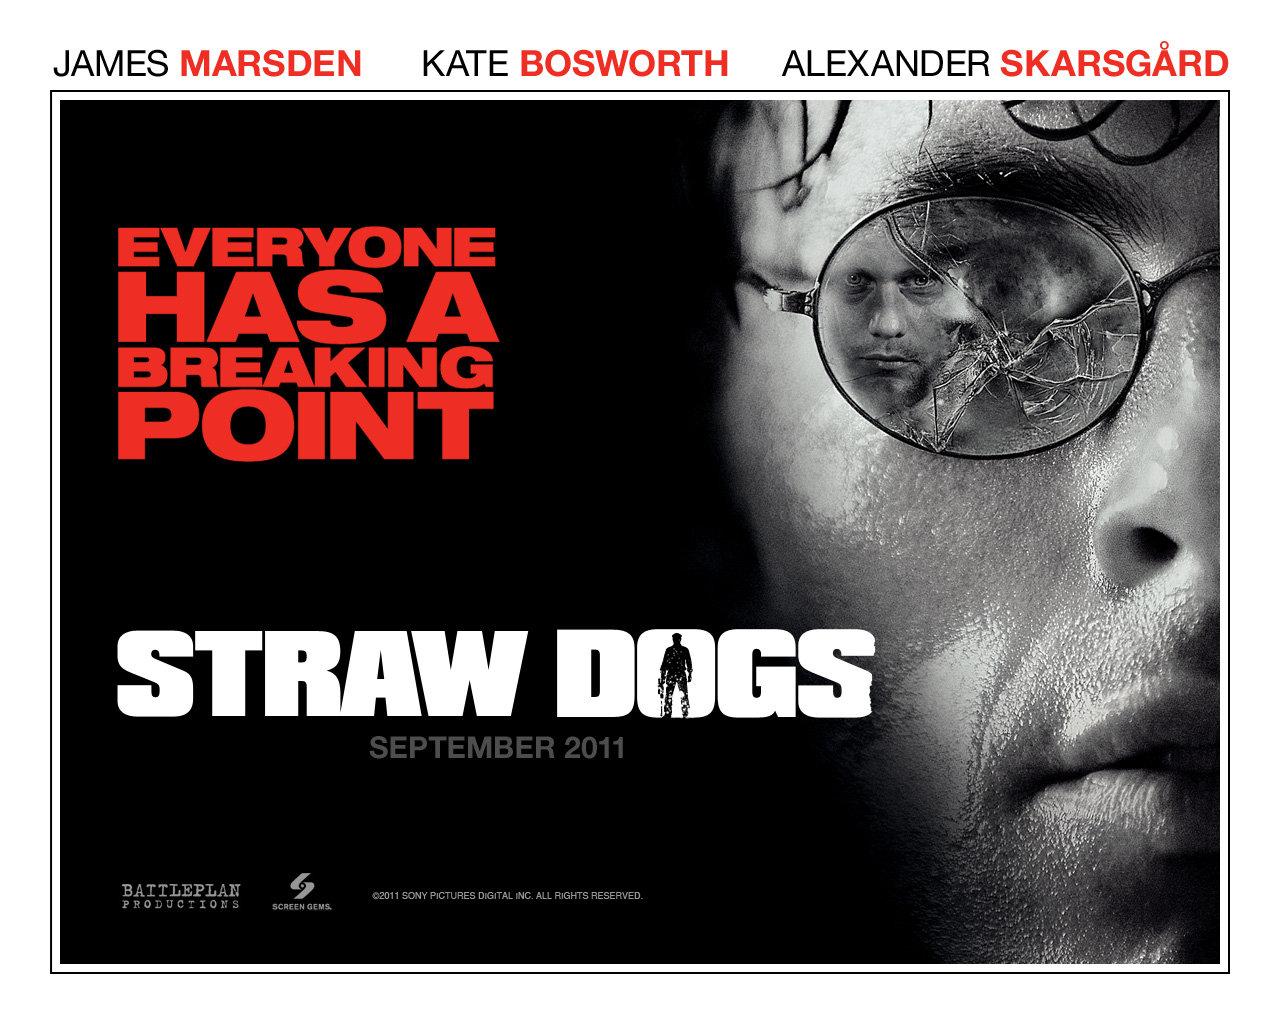 http://4.bp.blogspot.com/-Dlg7AJwp52Q/Tw-rpi5lCmI/AAAAAAAAEfE/7PN-98uzEVc/s1600/Straw-Dogs-Wallpaper-01.jpg